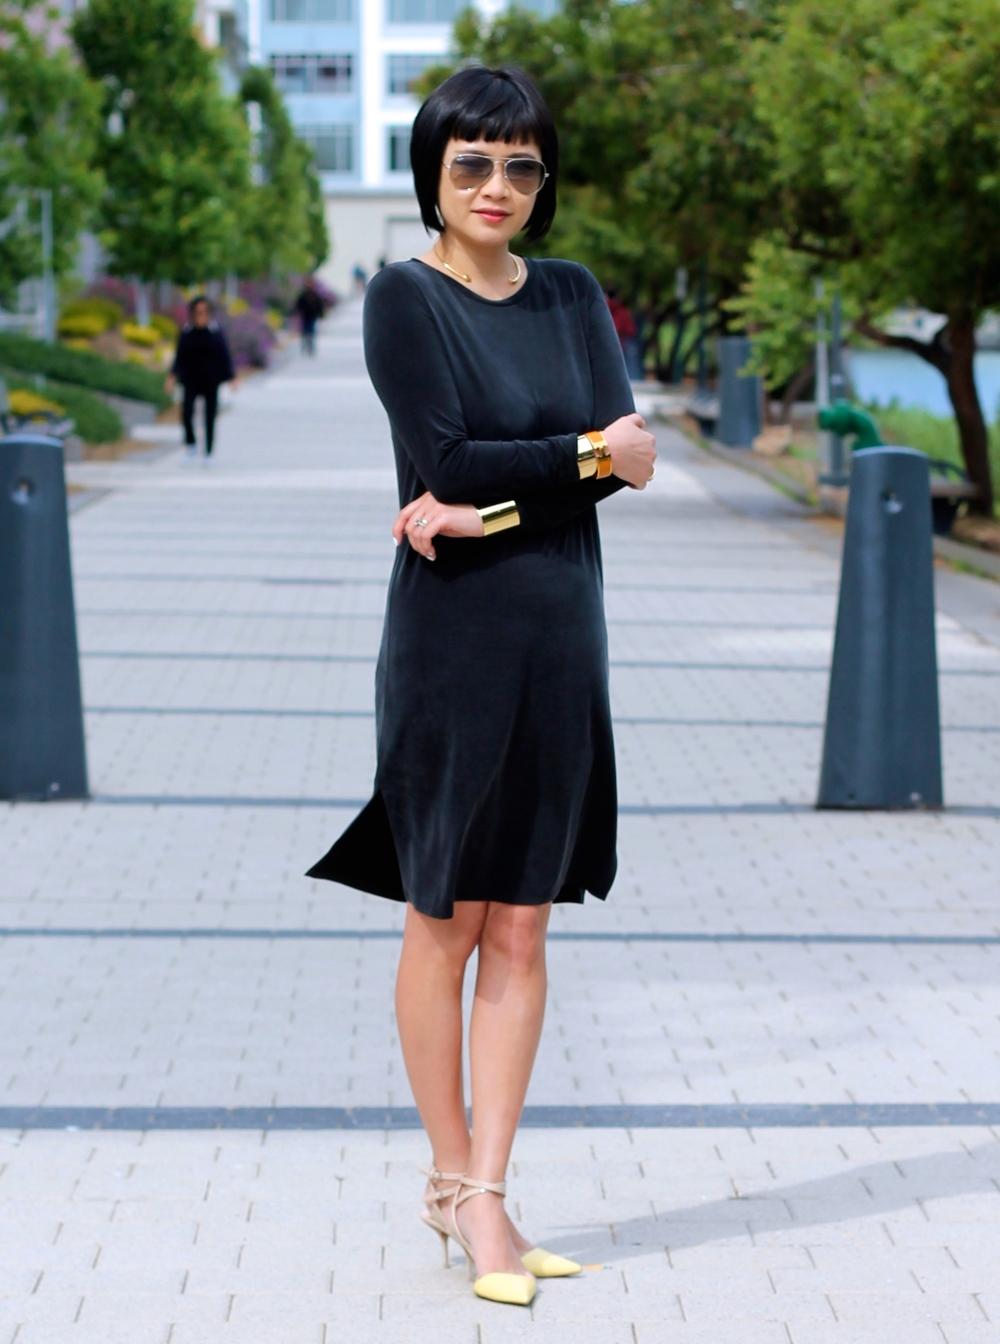 Aritzia dress, Zara shoes, Ray-Ban sunglasses